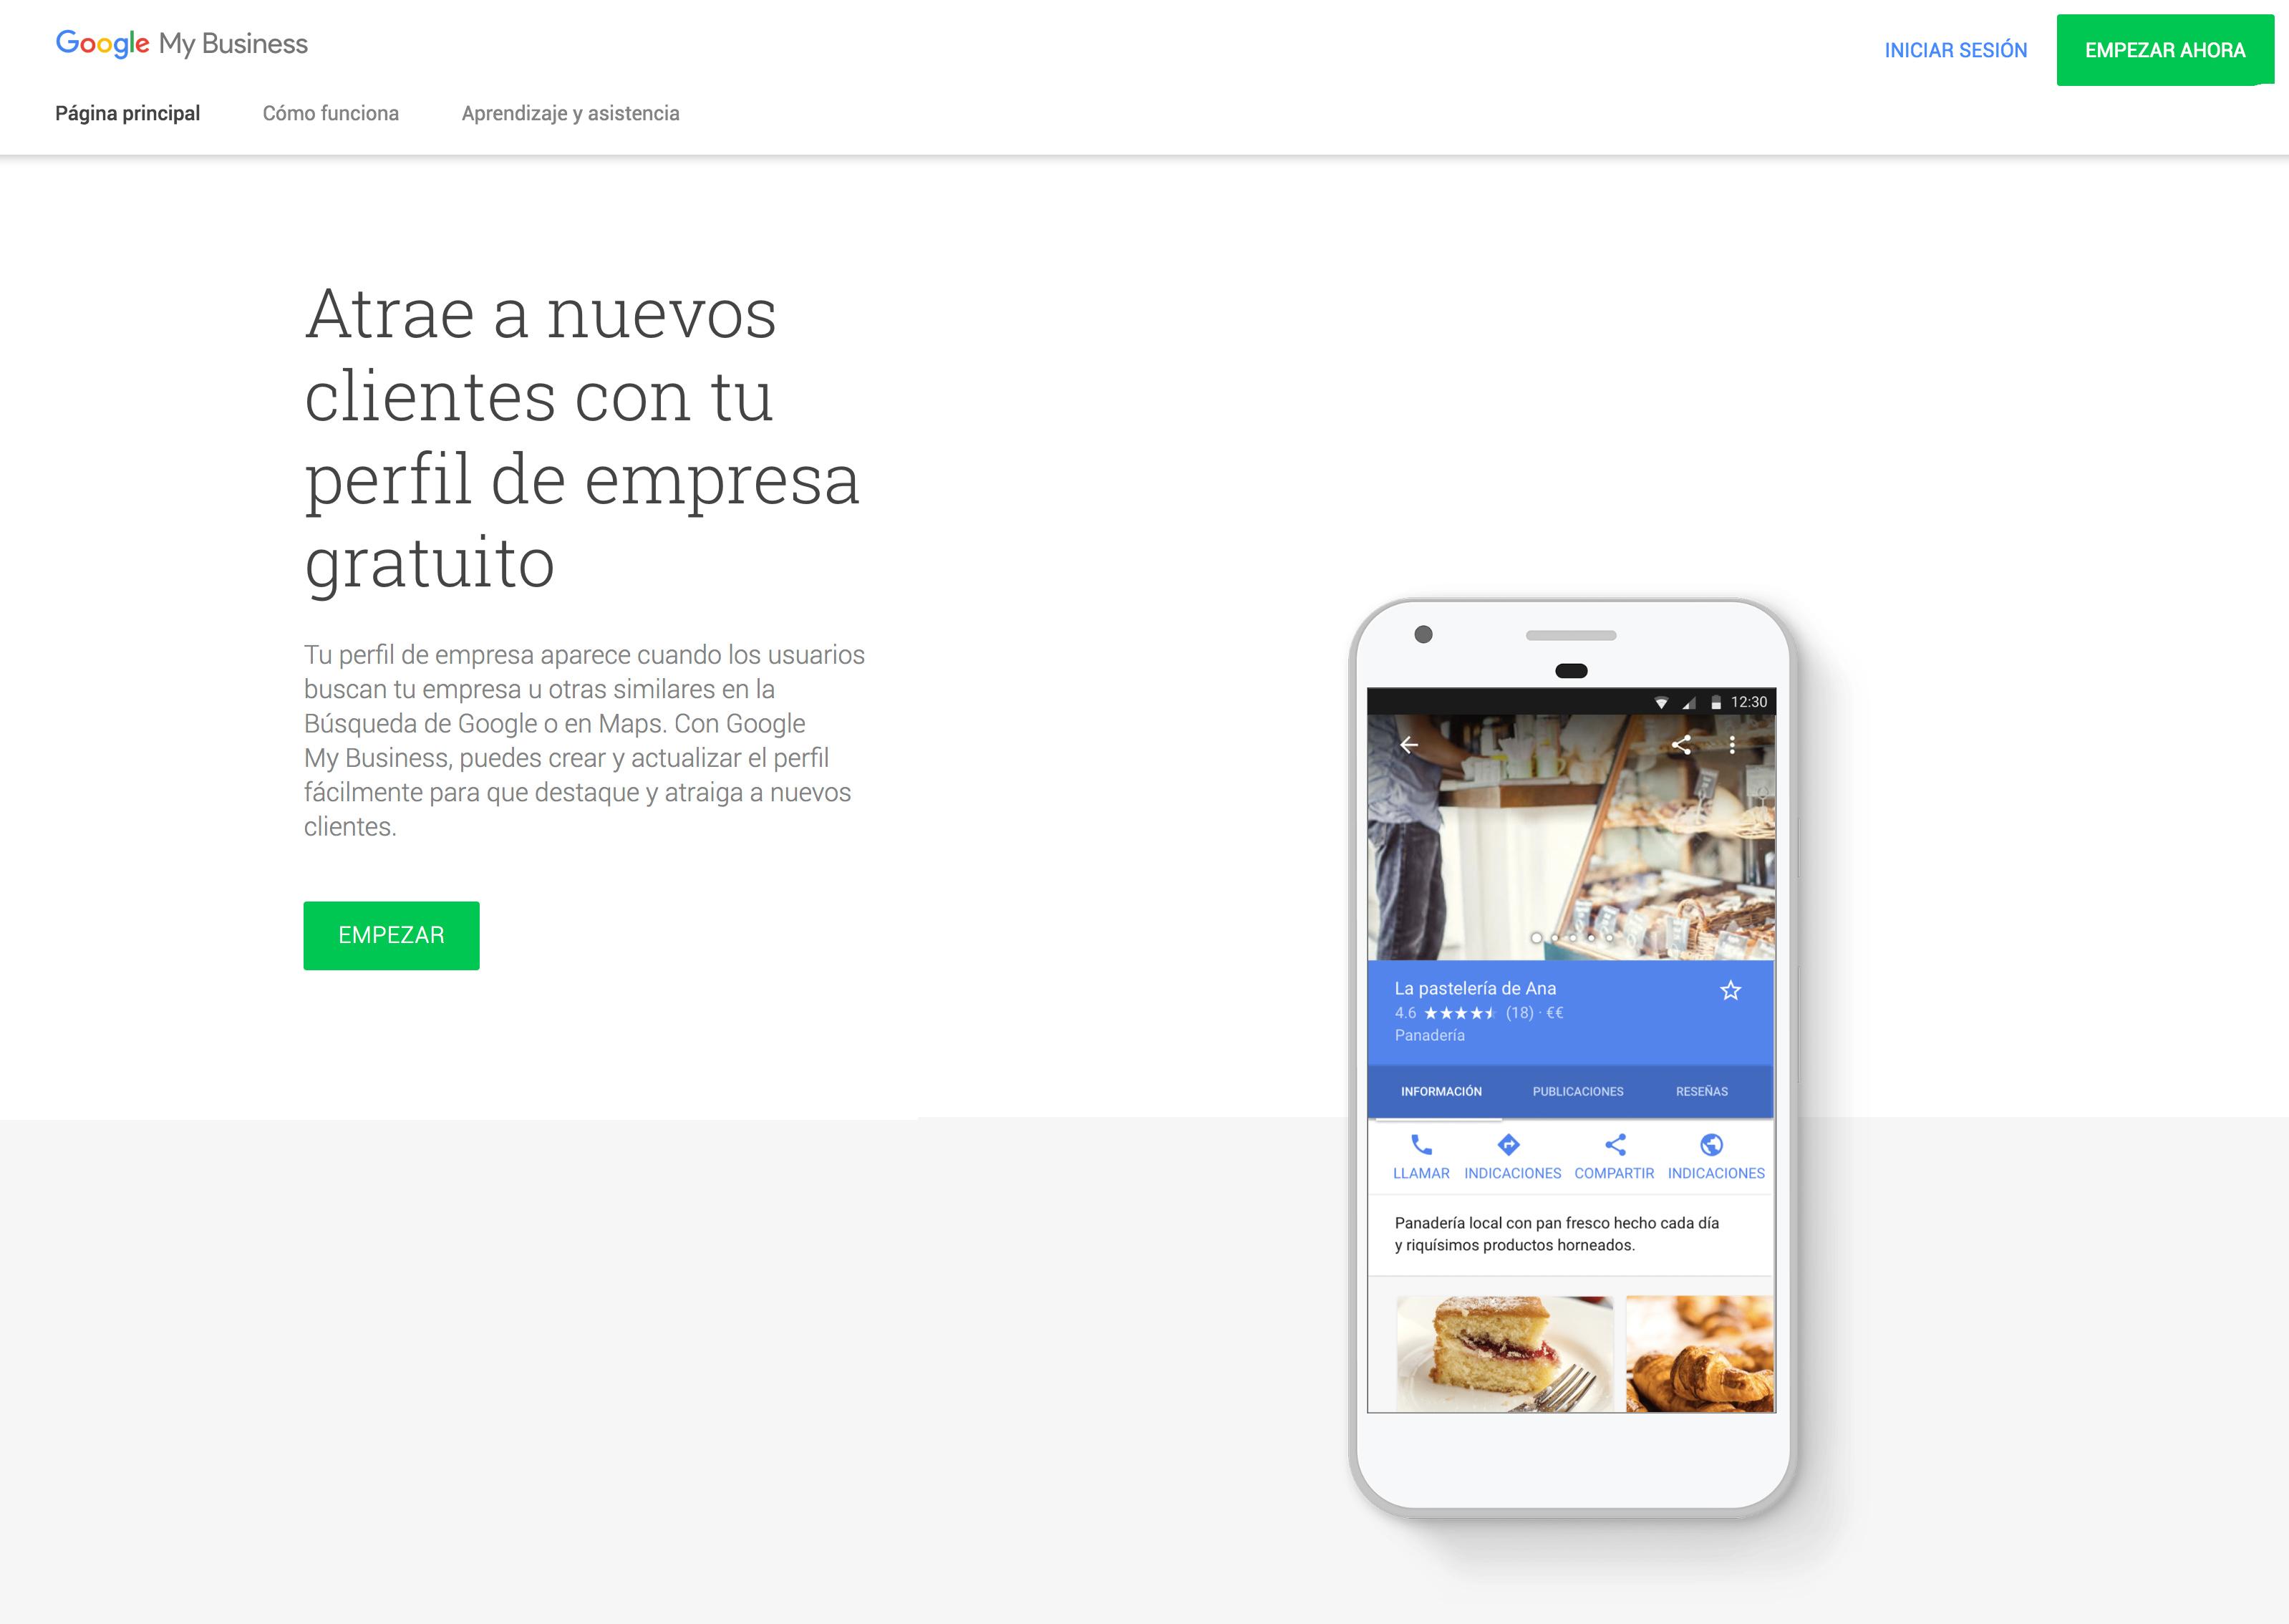 pagina web de google my business para empezar